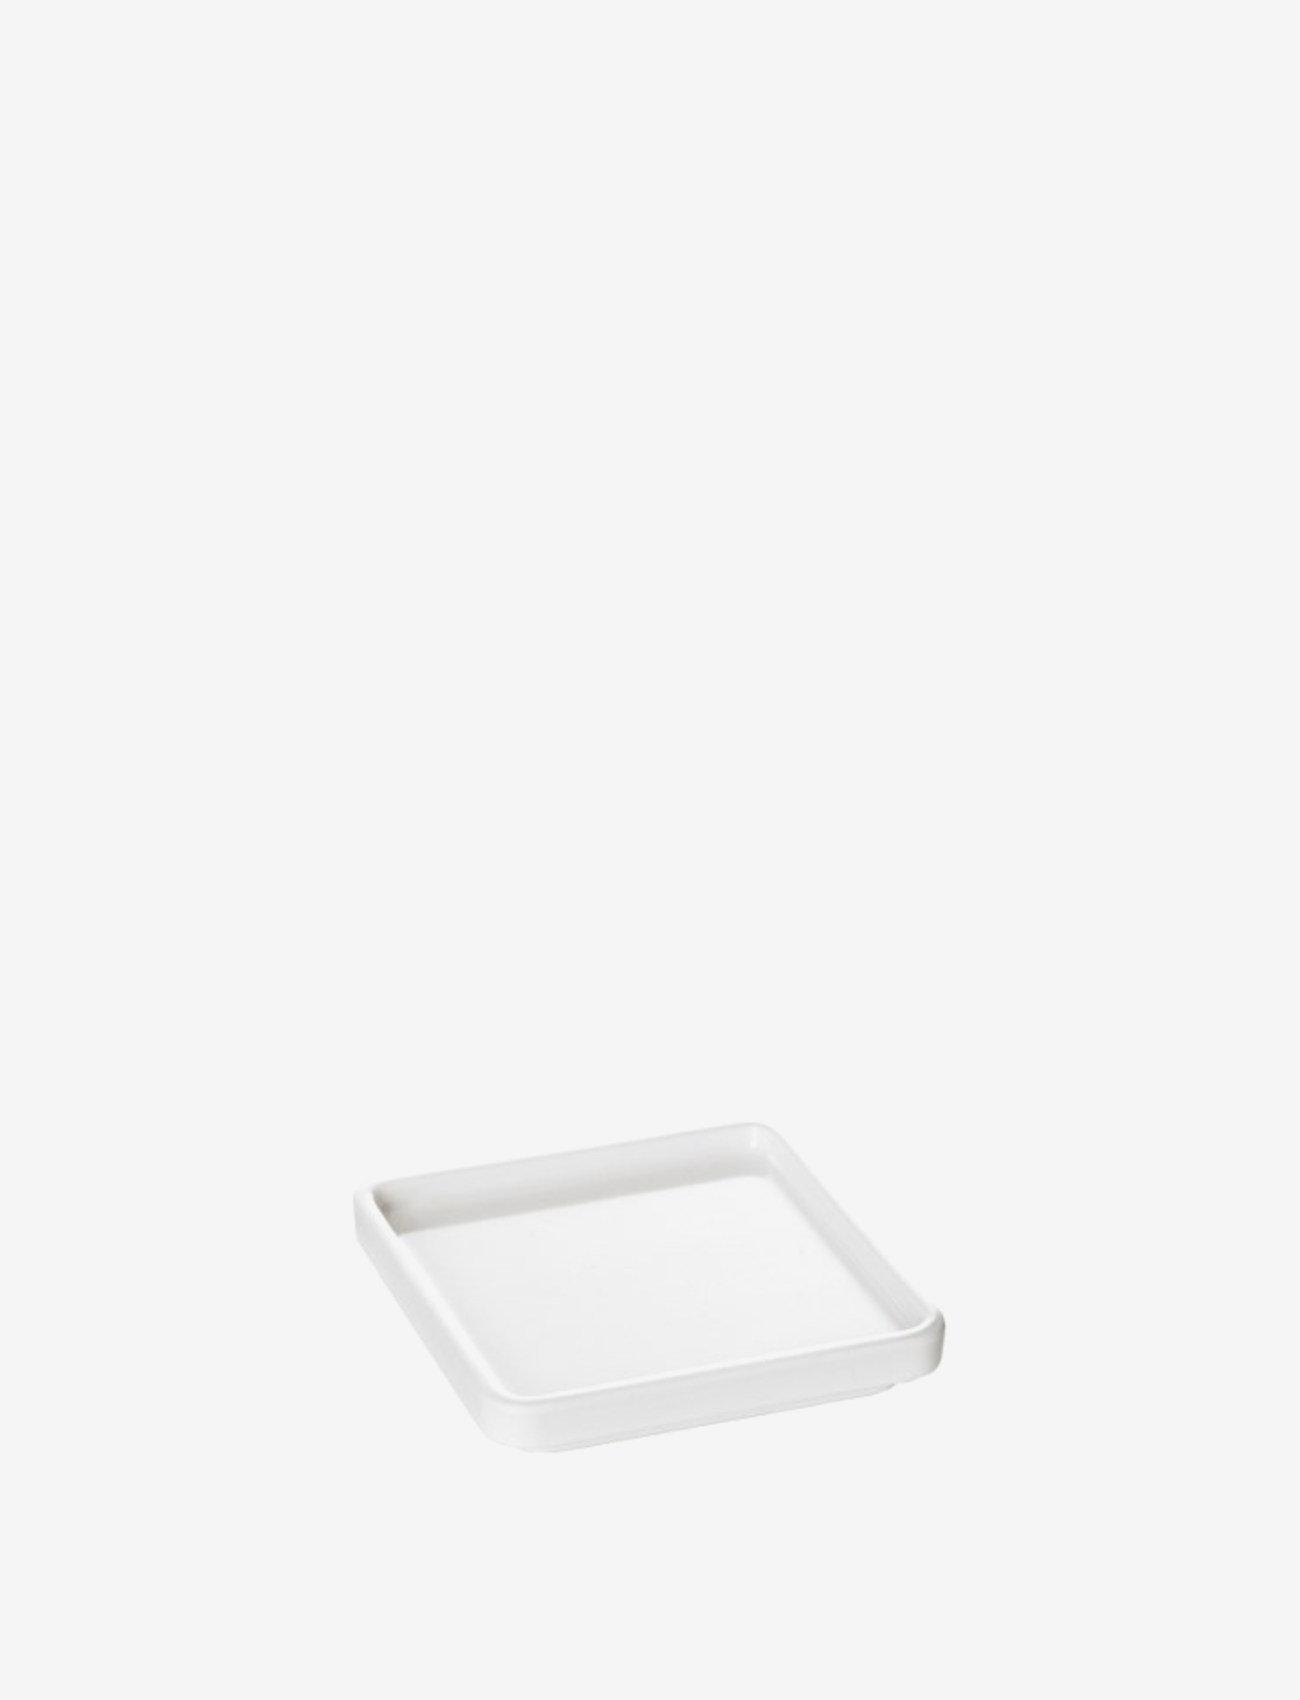 PANTONE - FOOD TRAY S WHITE 11-4800 - serveringsfat - white 11-4800 - 0